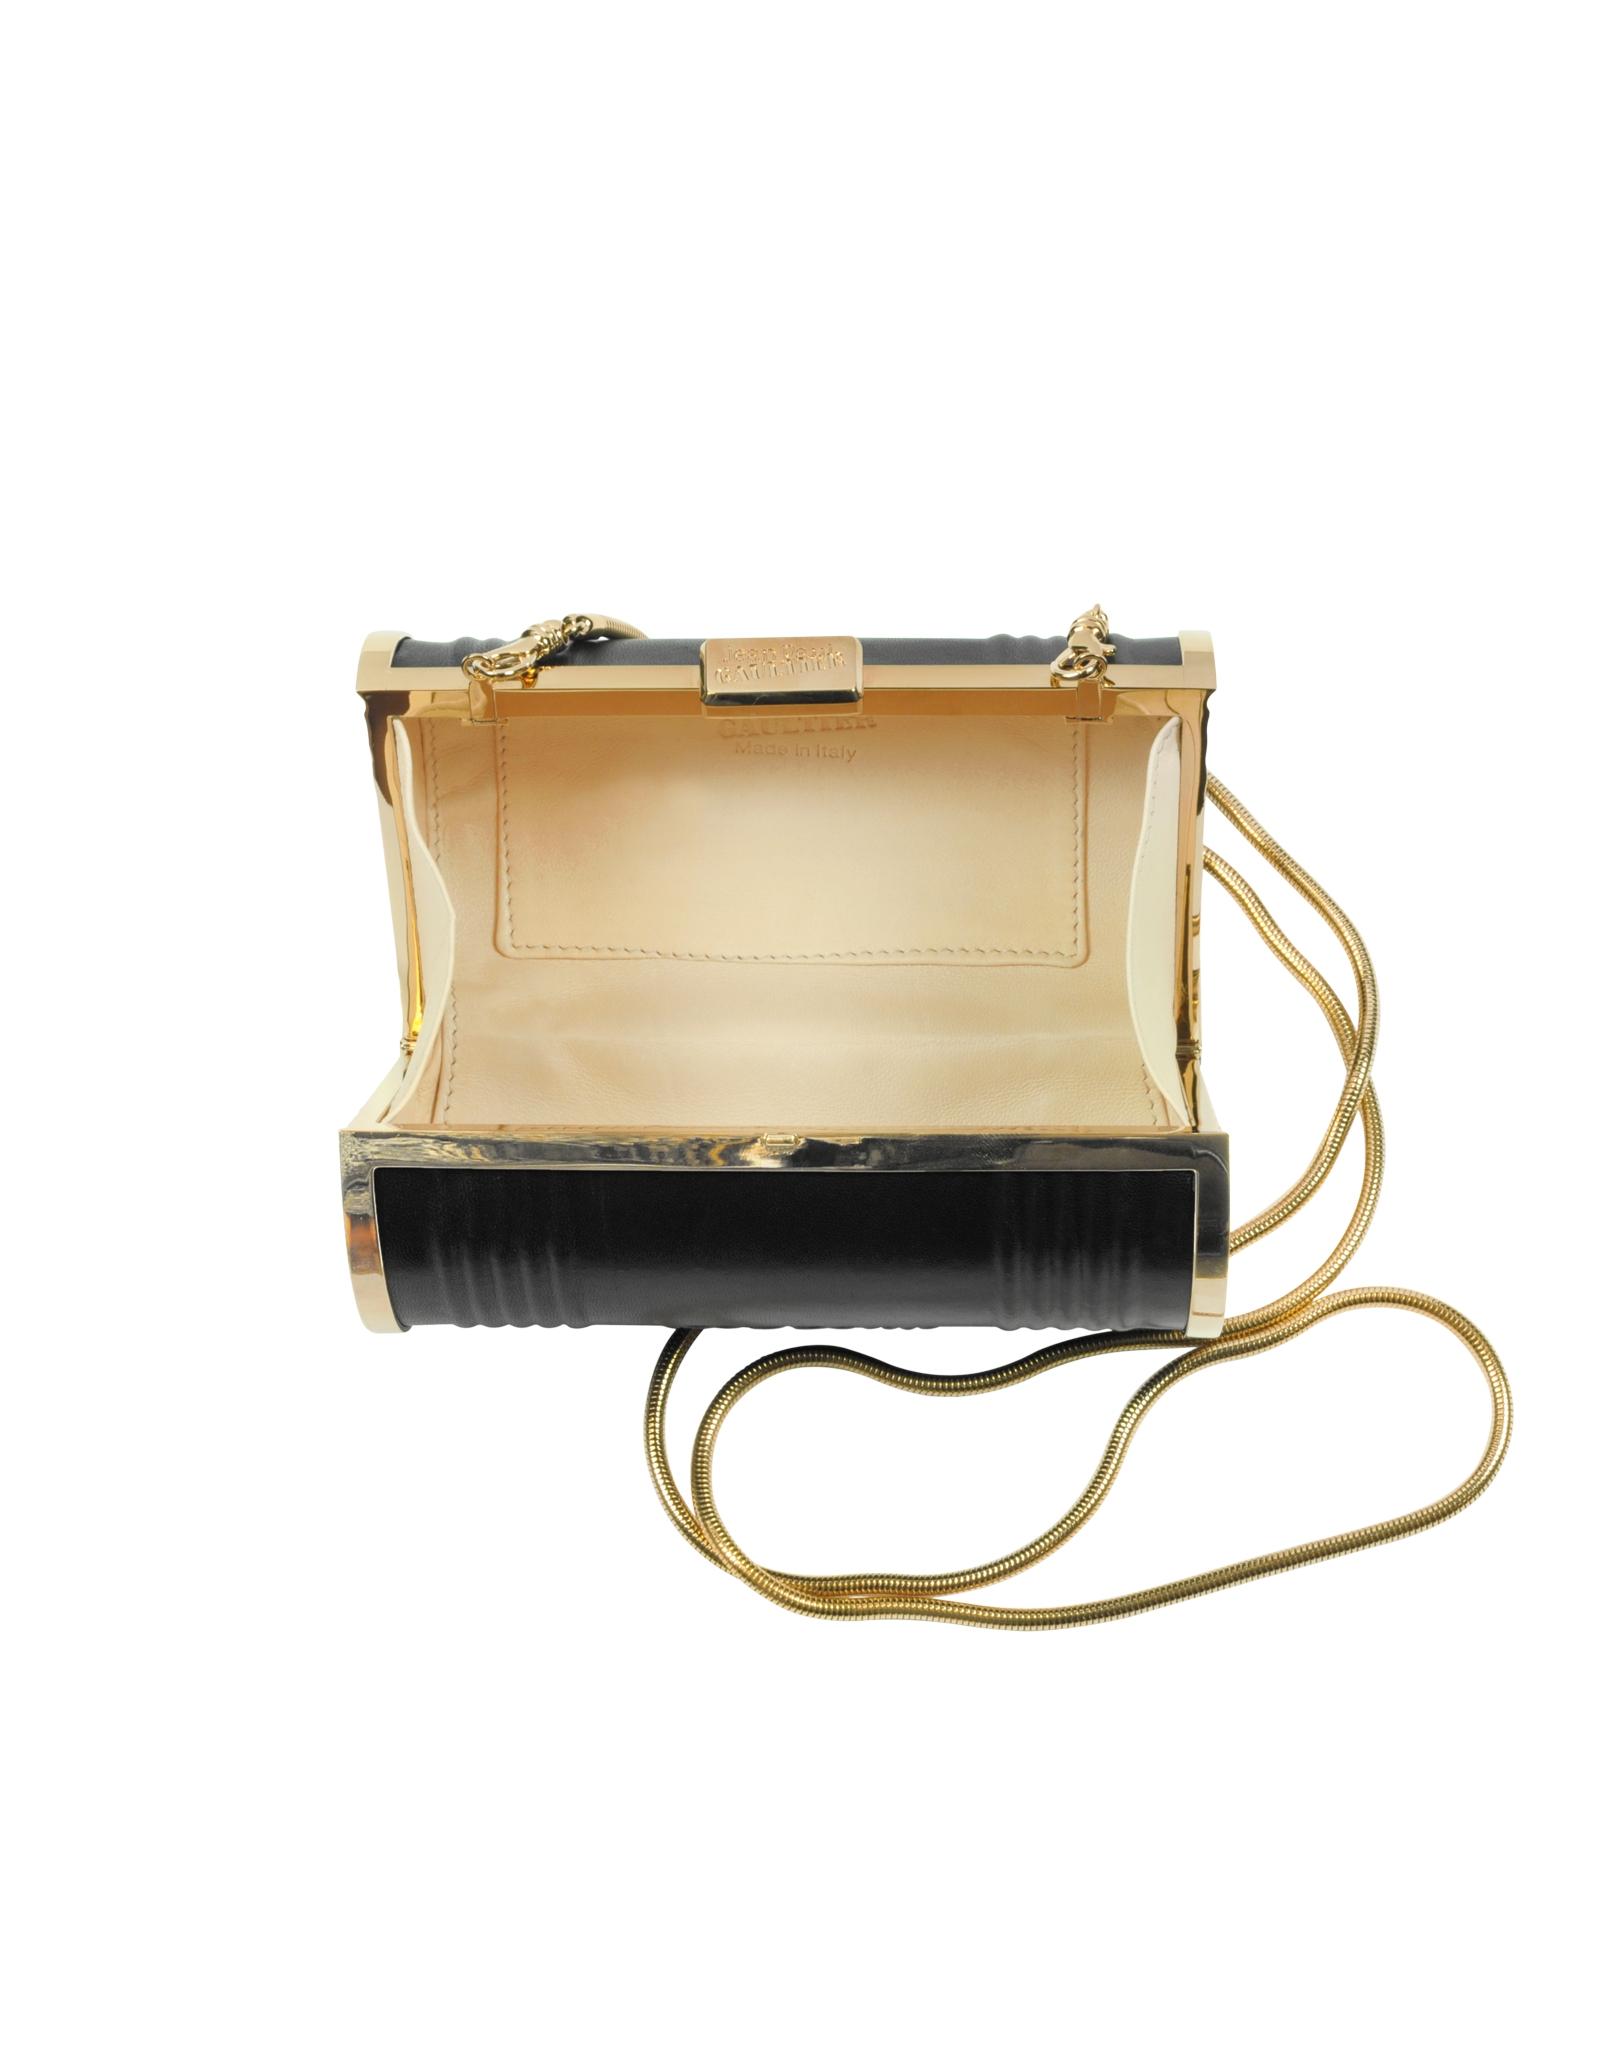 Jean Paul Gaultier Bag In Beige Leather With Chain 6n8iHjFDu